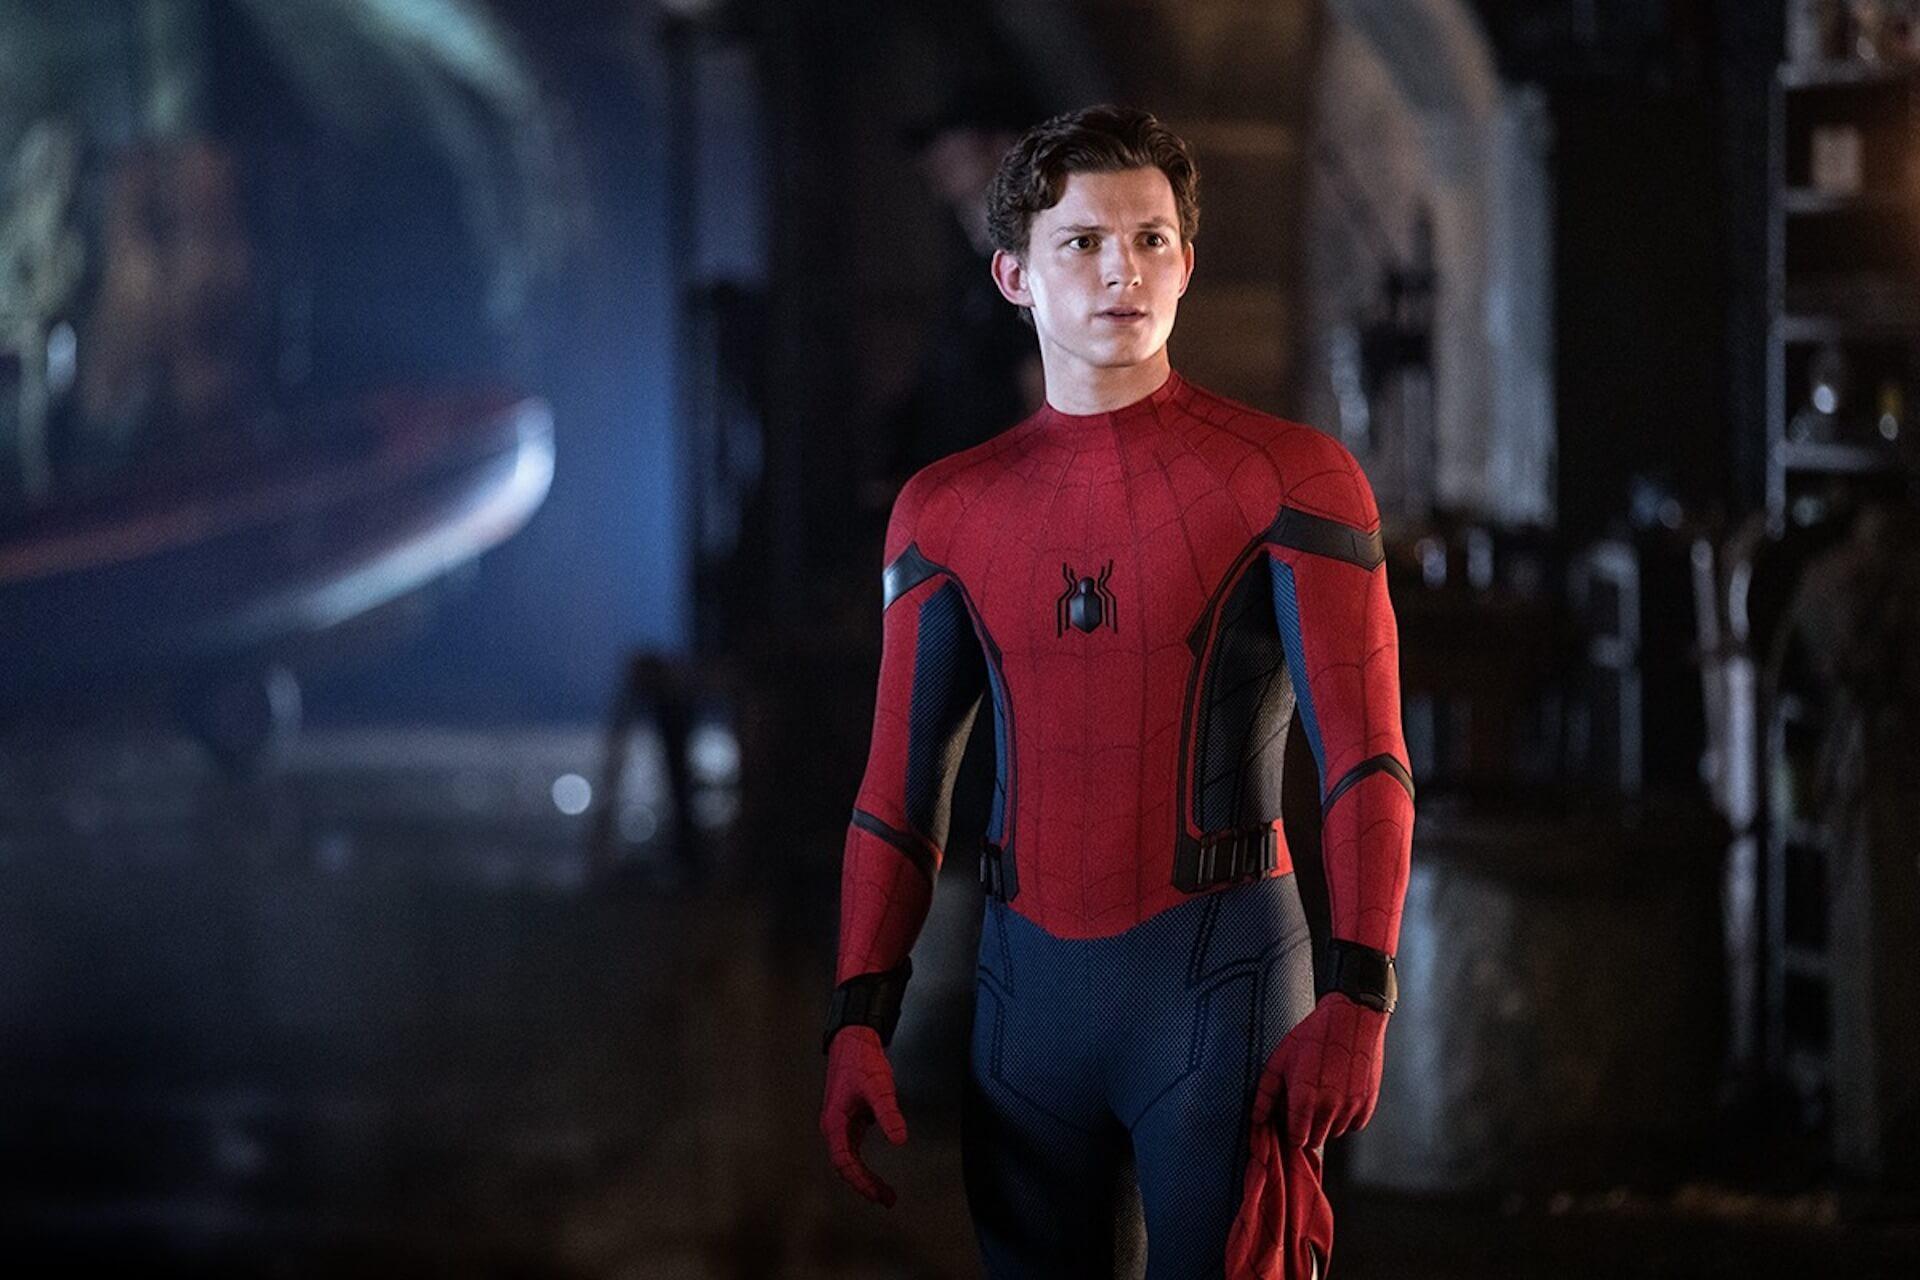 MCU版『スパイダーマン3』は単独のヒーロー映画史上最も野心的な映画になる?主演のトム・ホランドが示唆 film210205_spiderman3_main